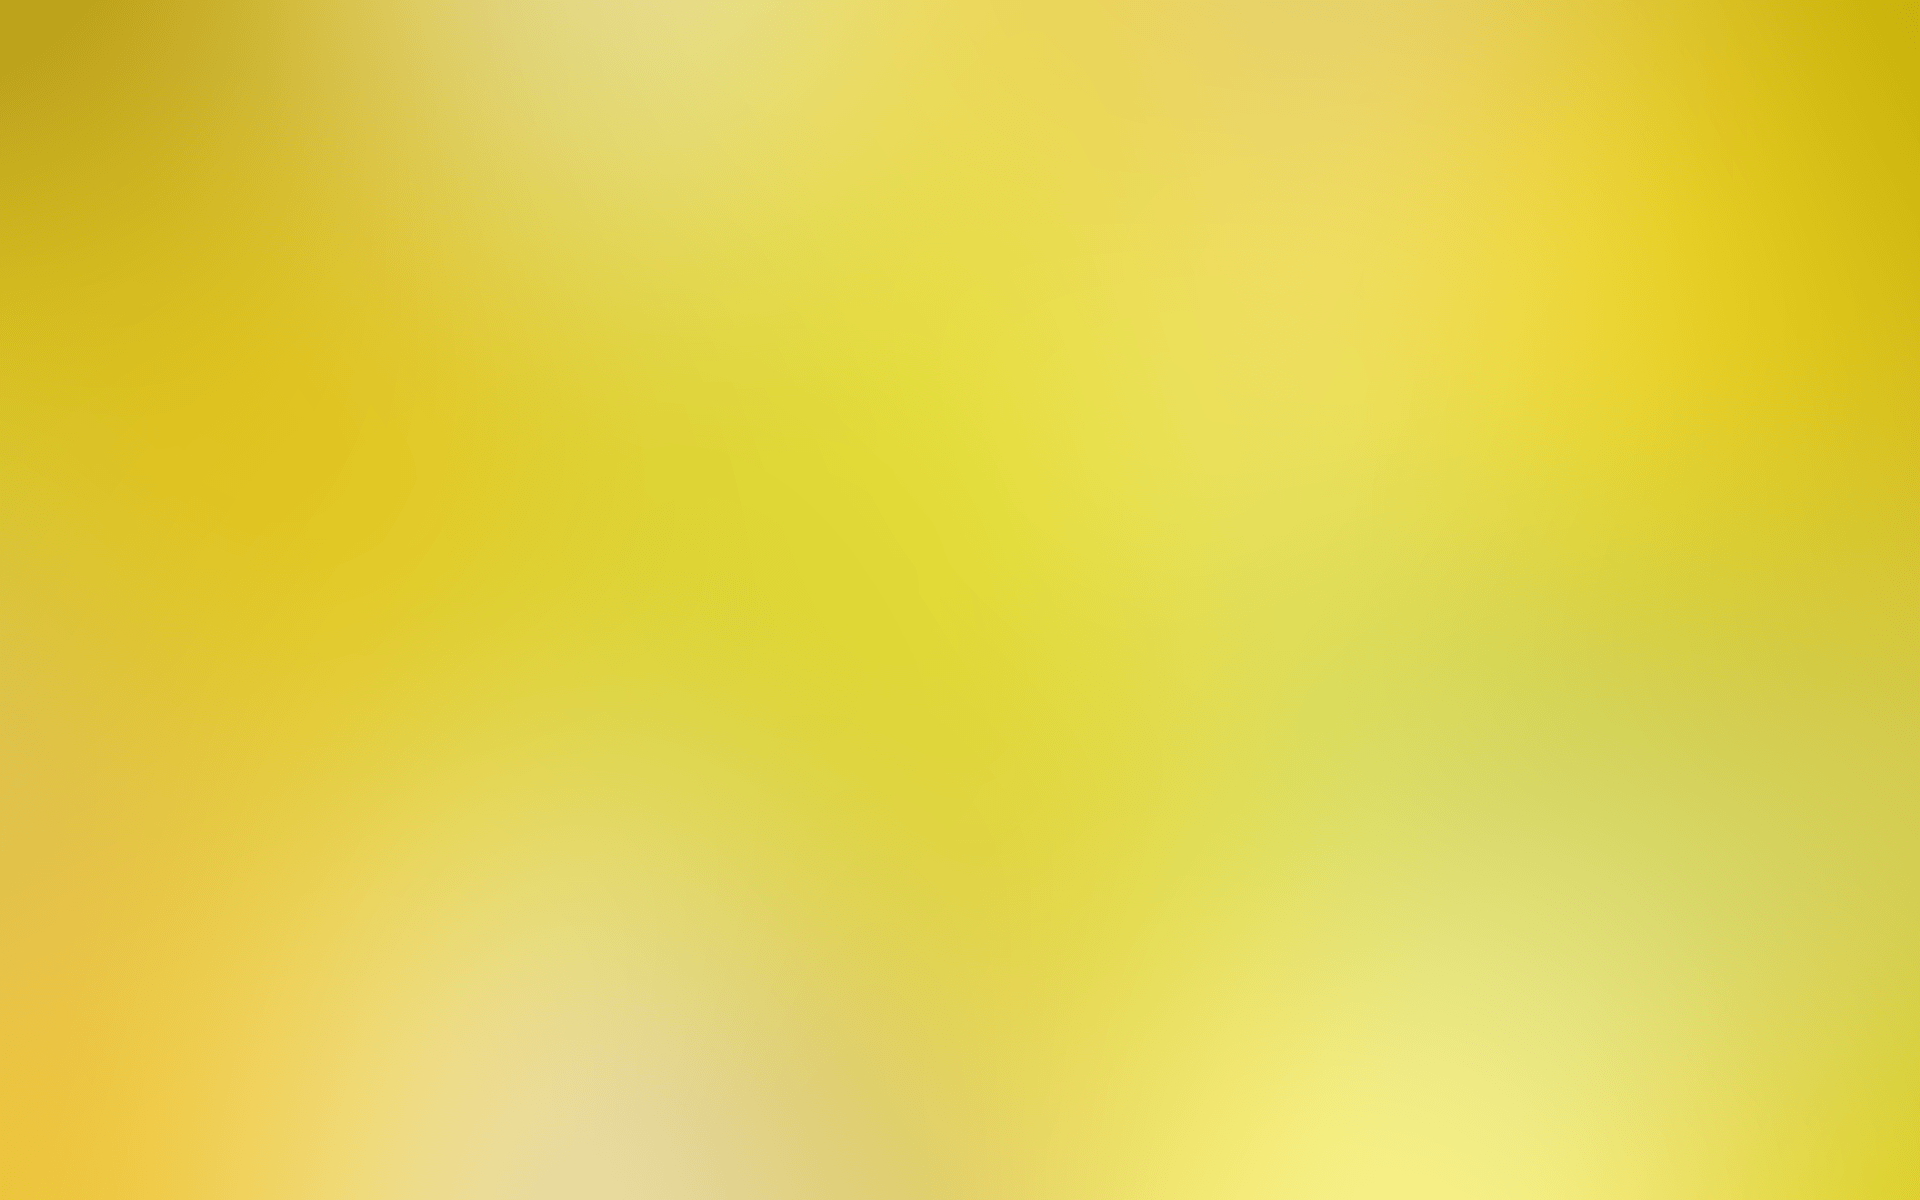 yellow wallpaper 33 - photo #14